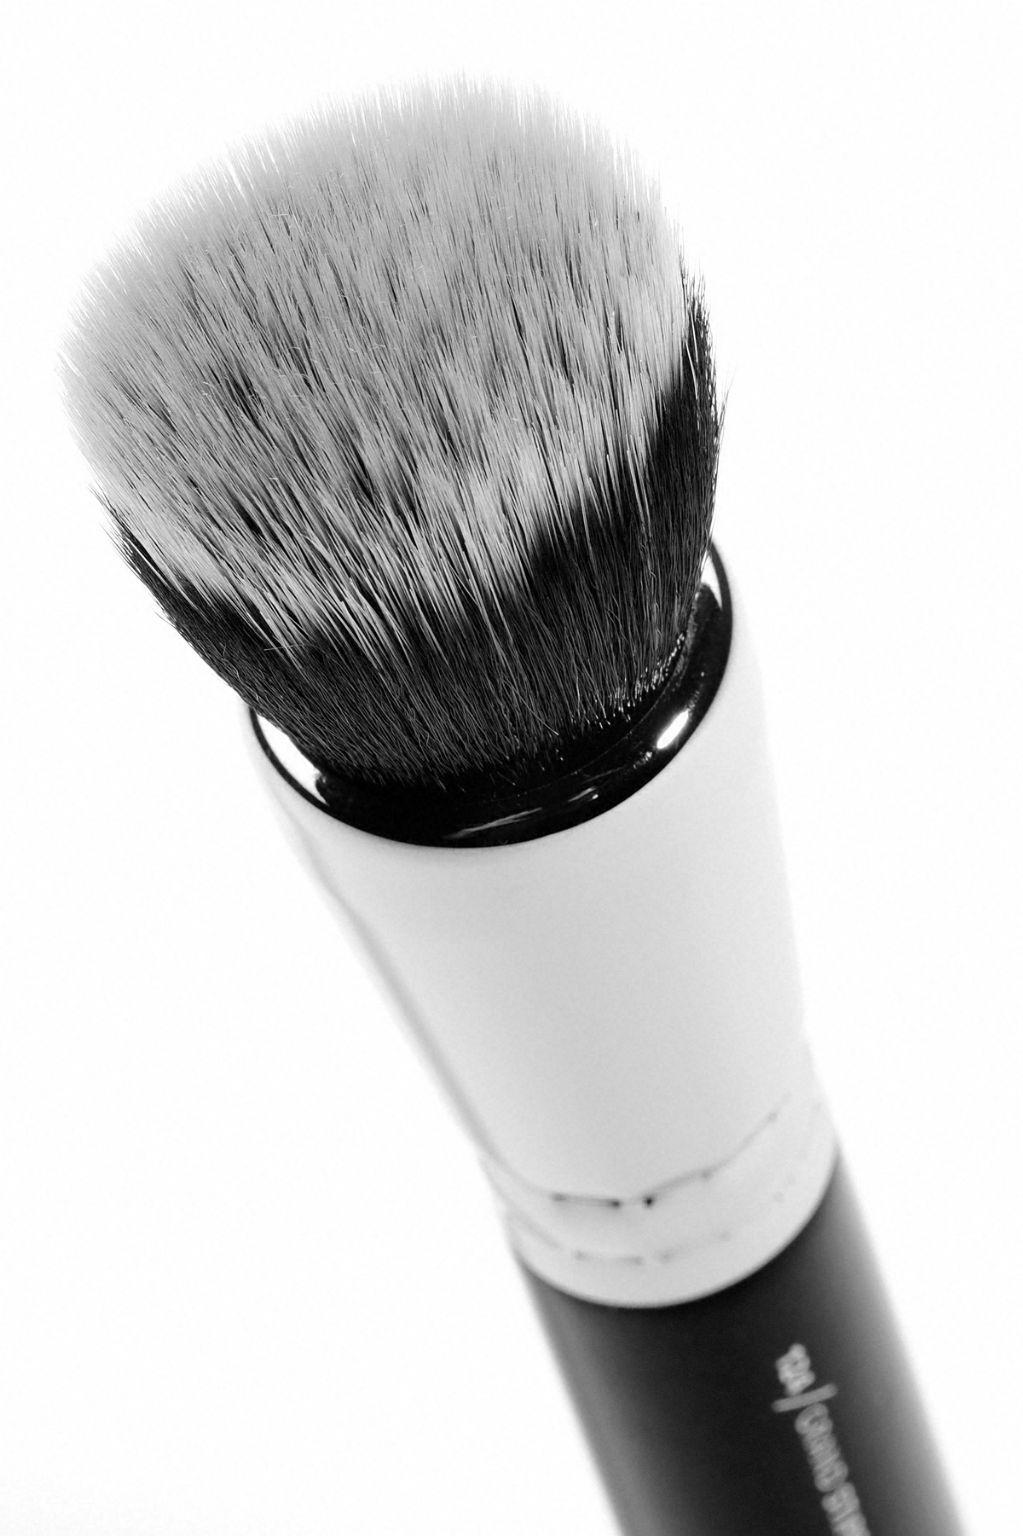 124 Grand Stippling Brush by zoeva #19